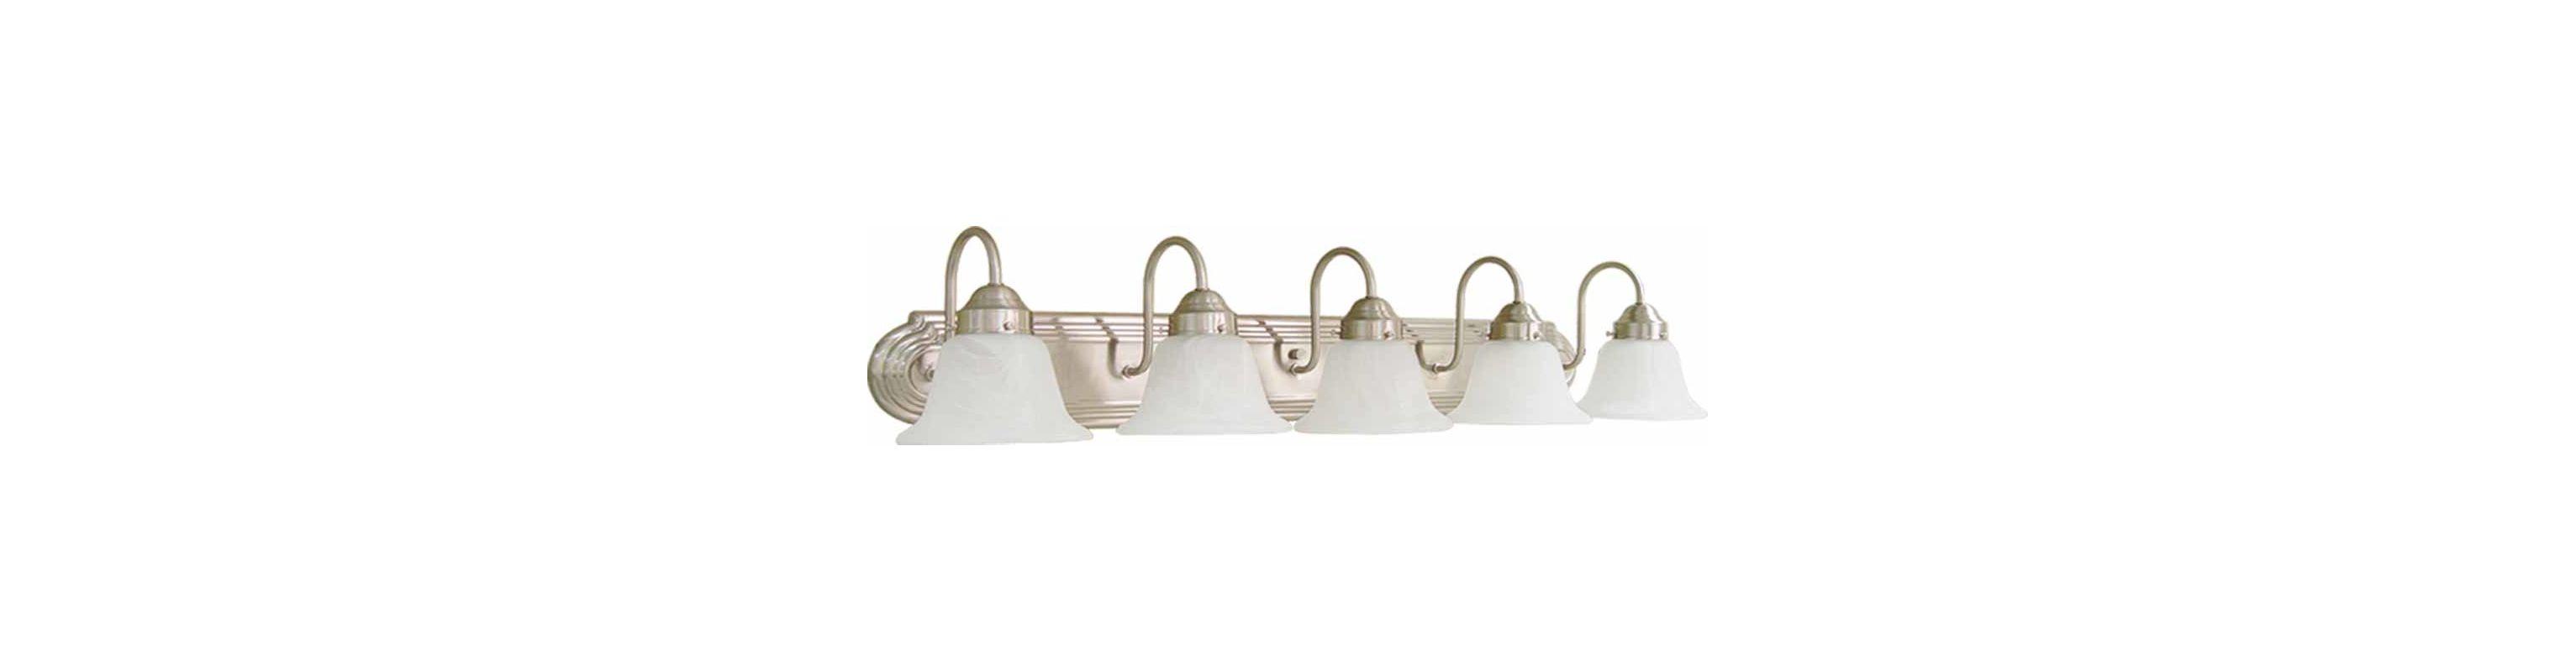 "Volume Lighting V1345 Marti 5 Light 38"" Width Bathroom Vanity Light"